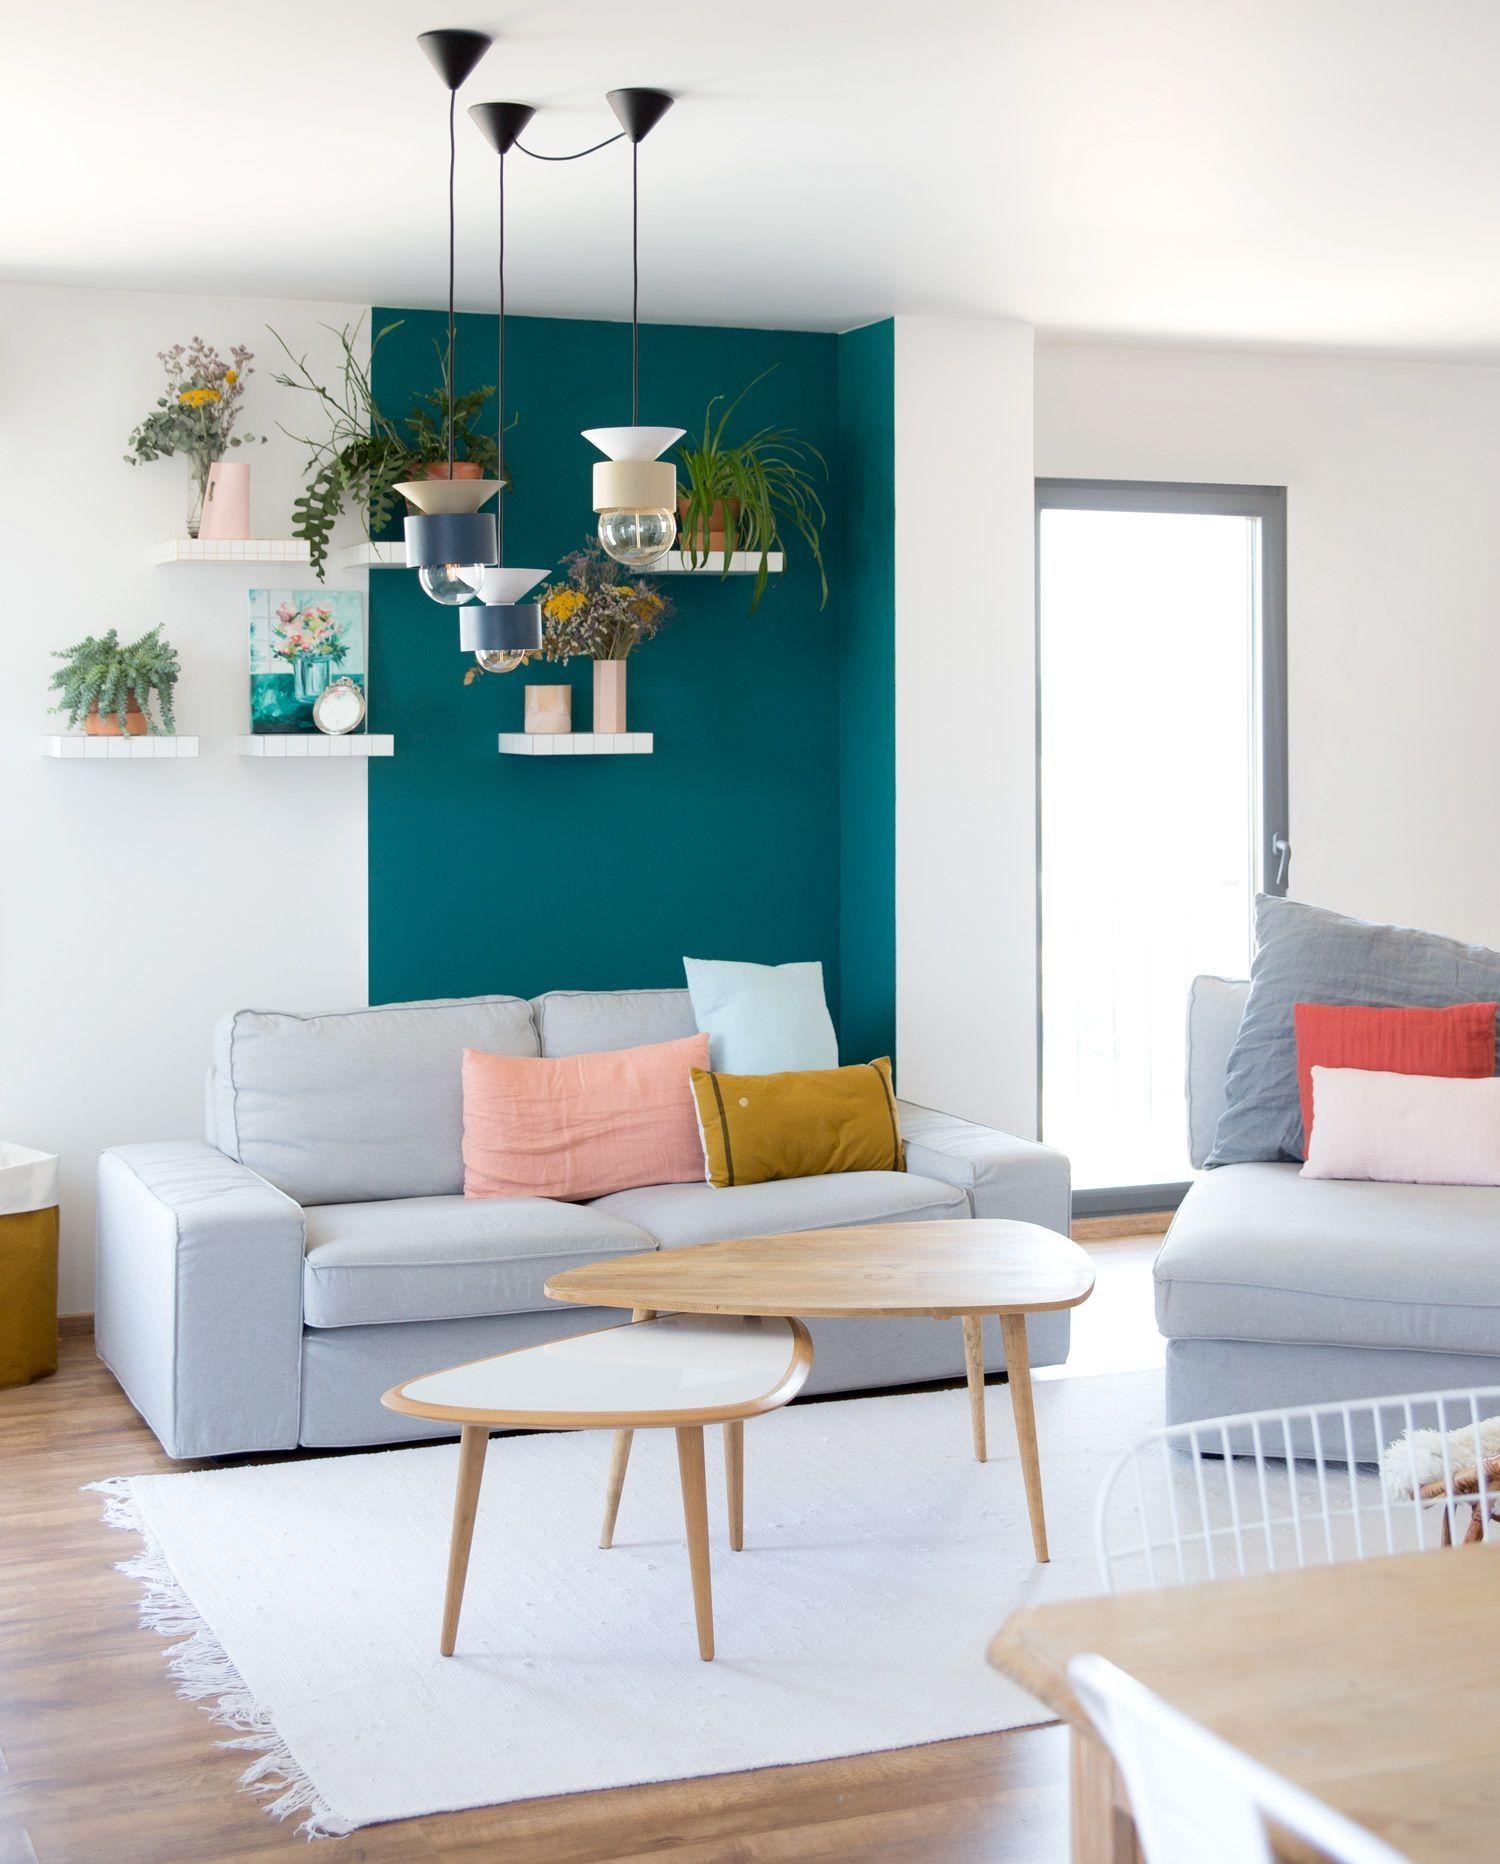 16 Deco Salon Mur Turquoise Check more at https://birds16alice.com